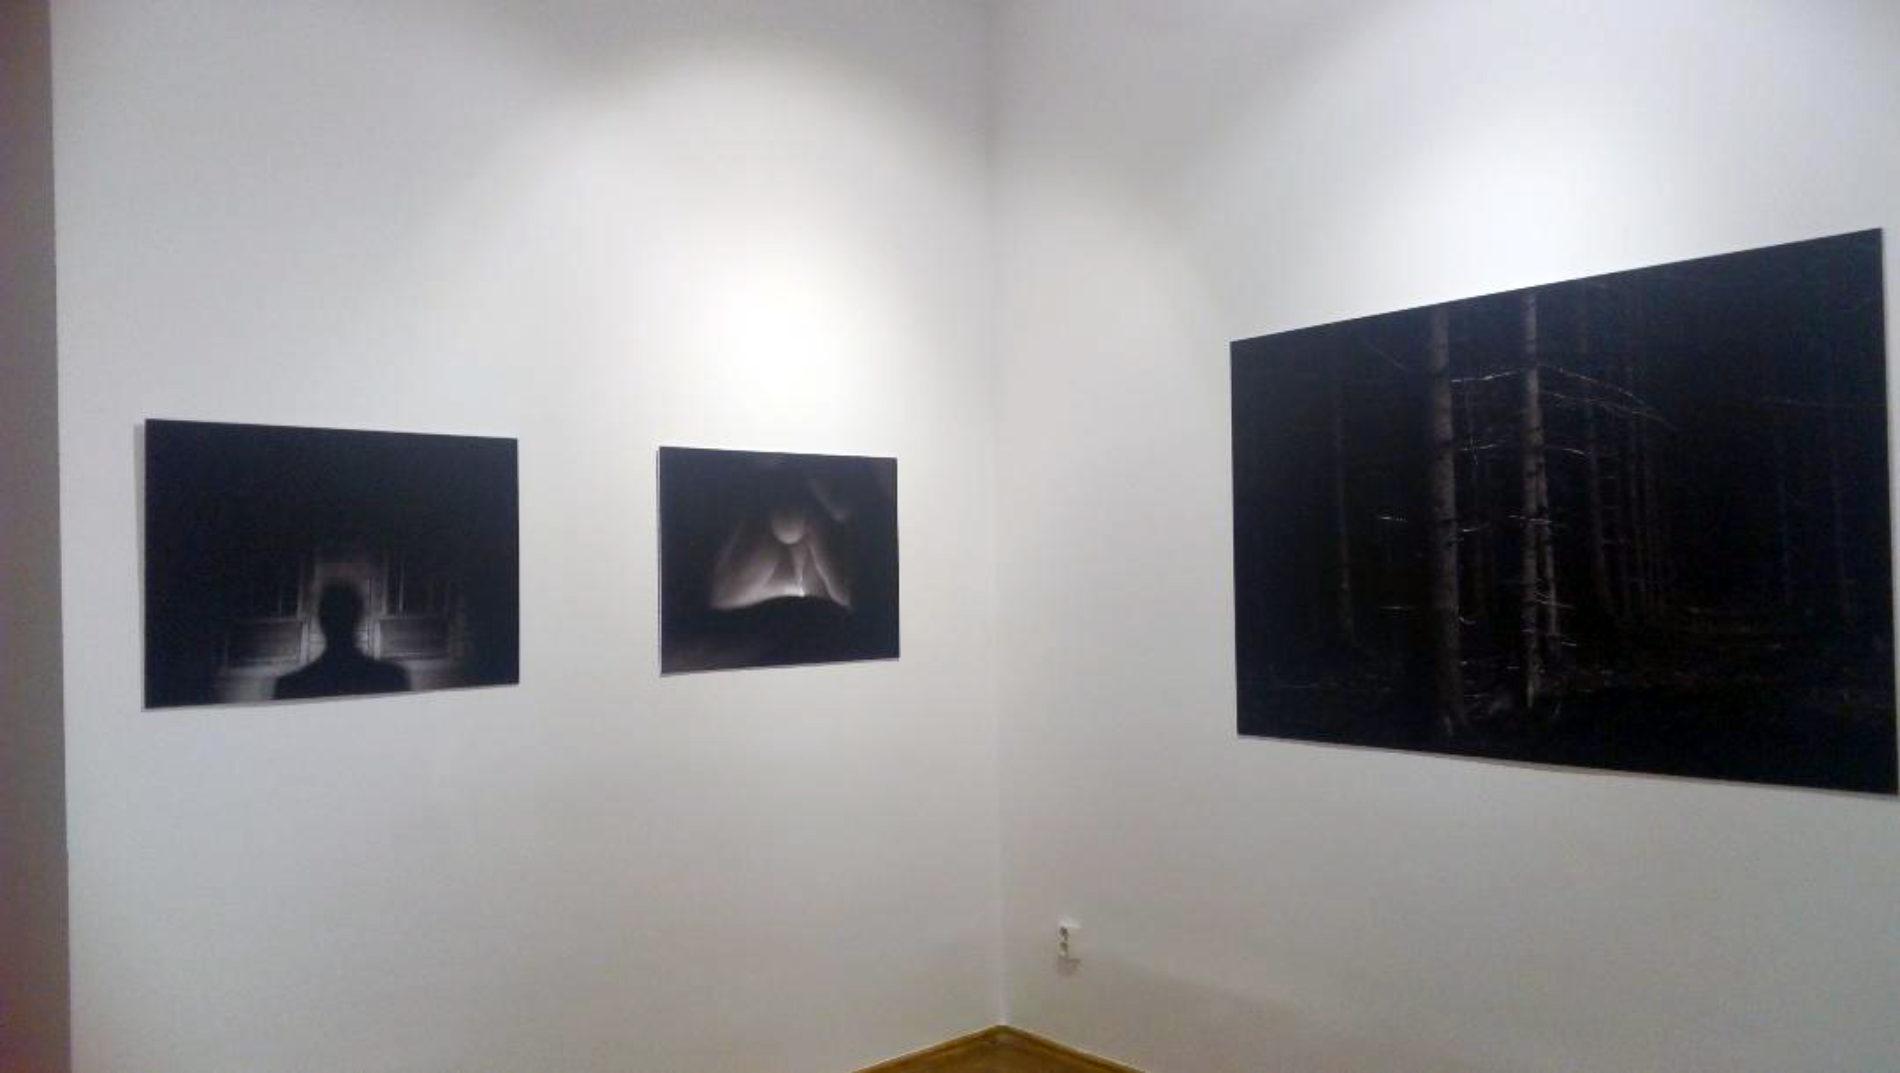 Angstwurm | Micleușanu M. // Opening show